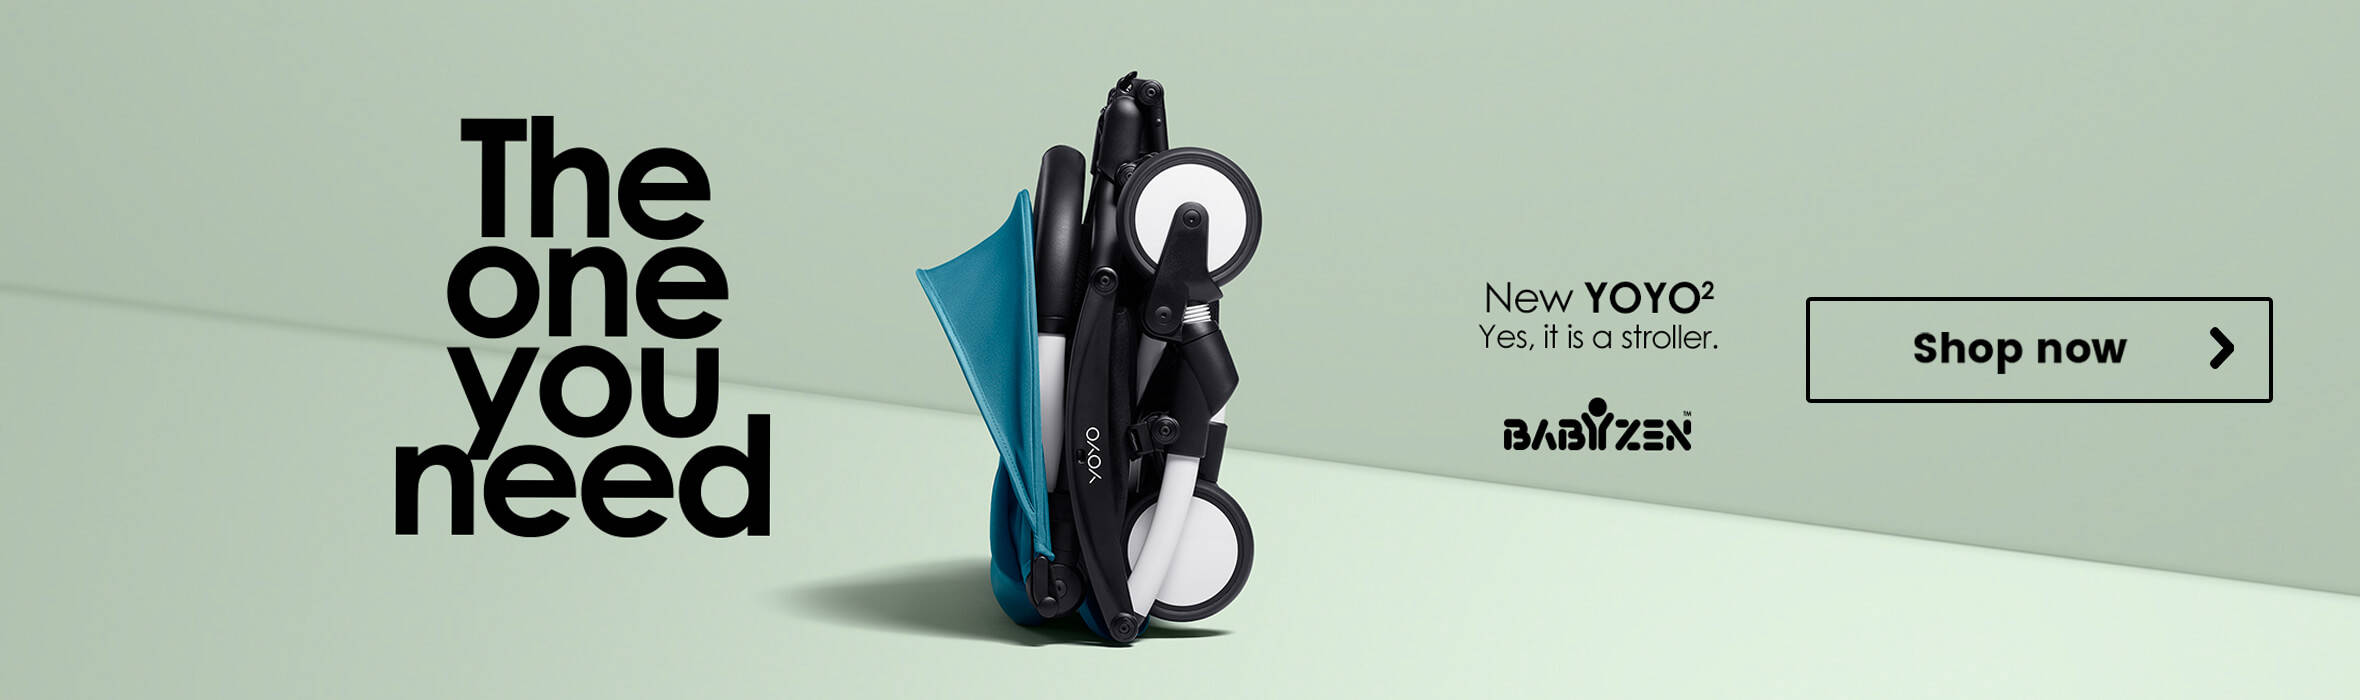 New Babyzen YOYO2 Stroller